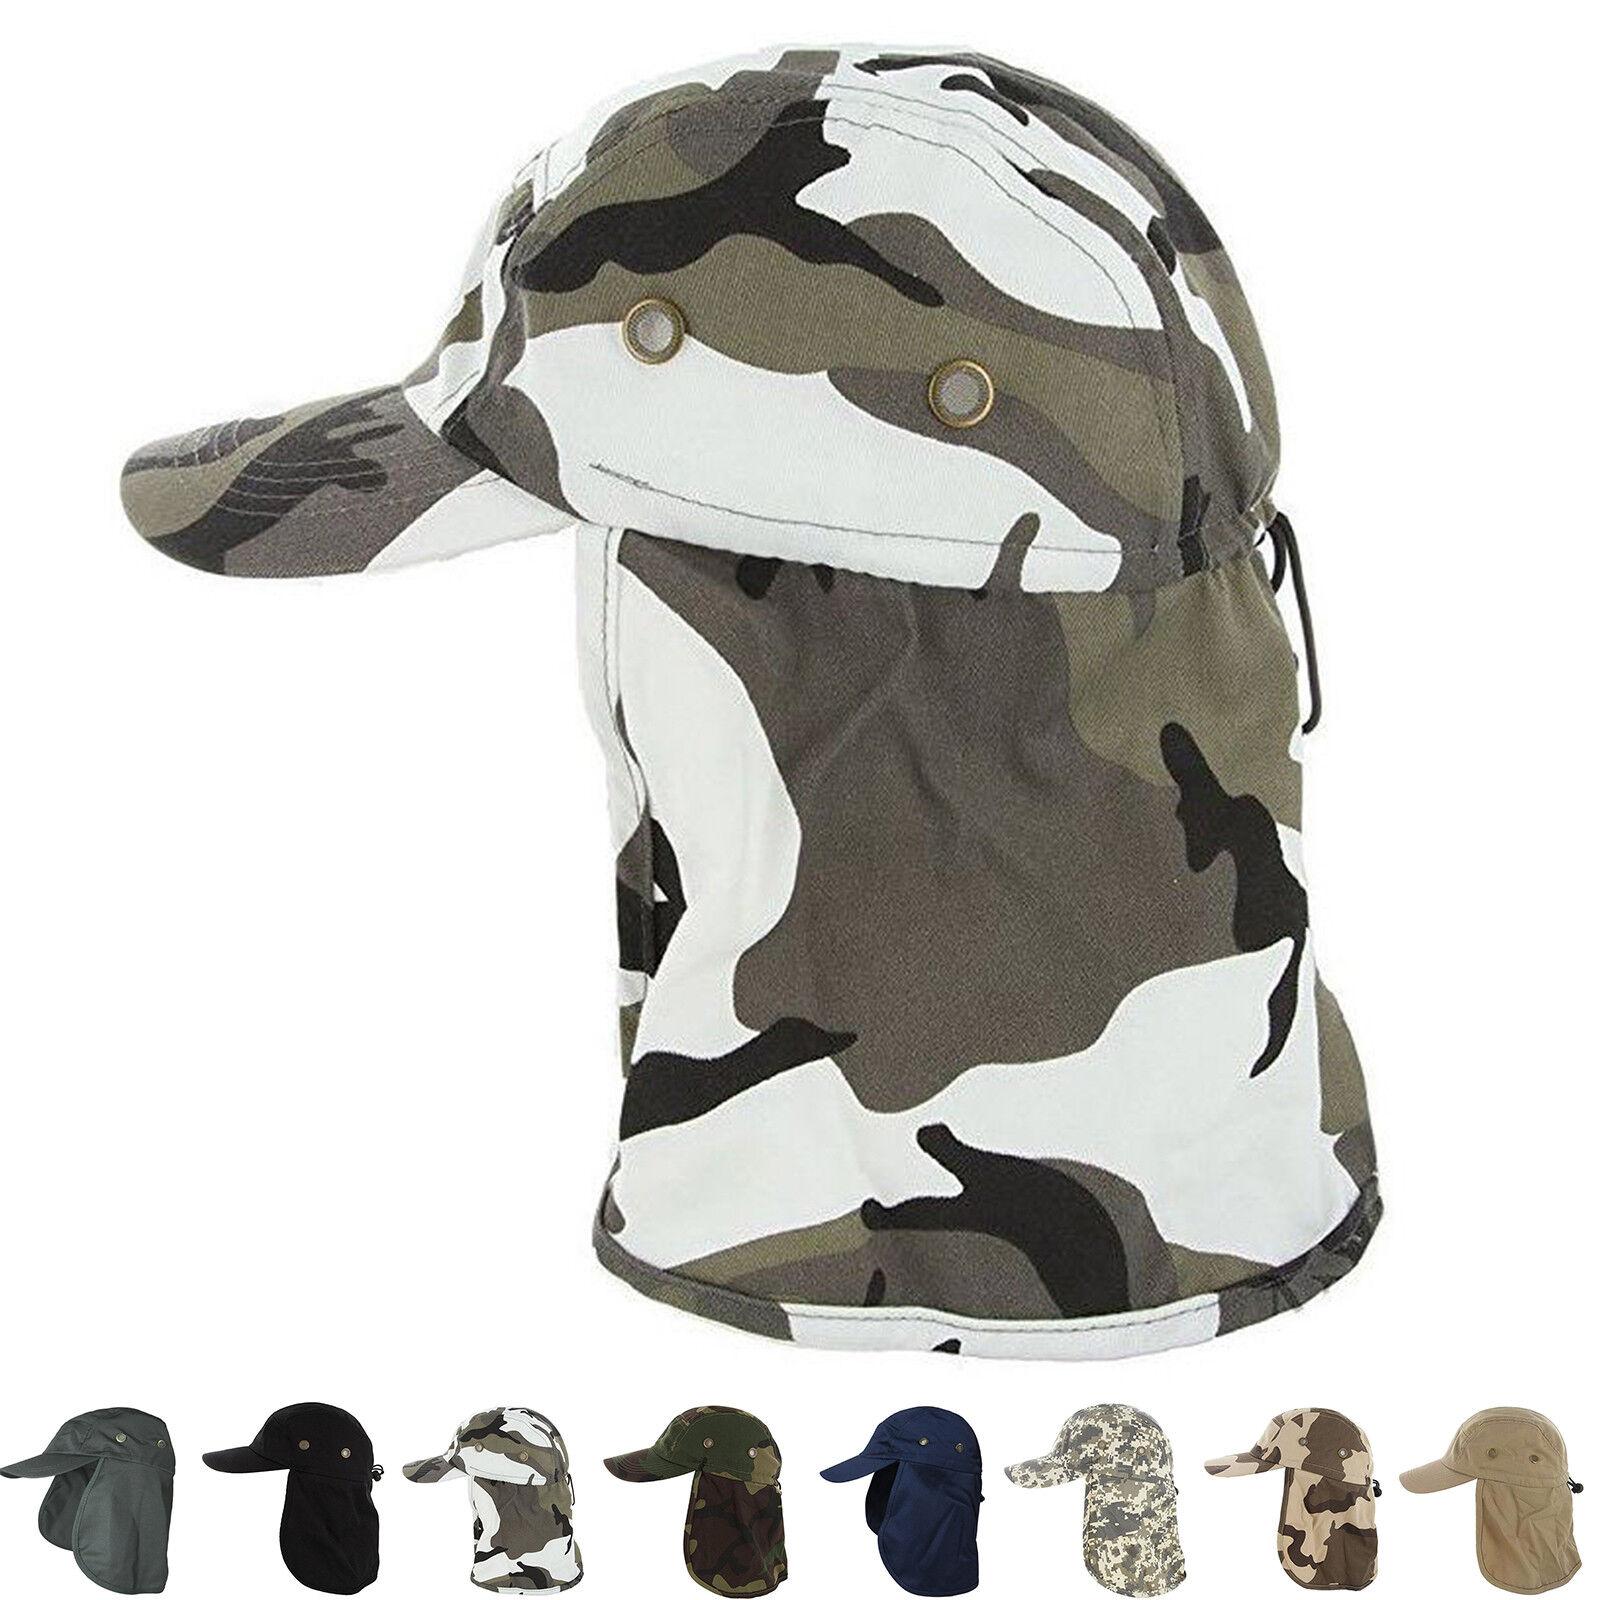 Baseball Cap Camping Boonie Fishing Ear Flap Sun Neck Cover Visor Camo Army Hat